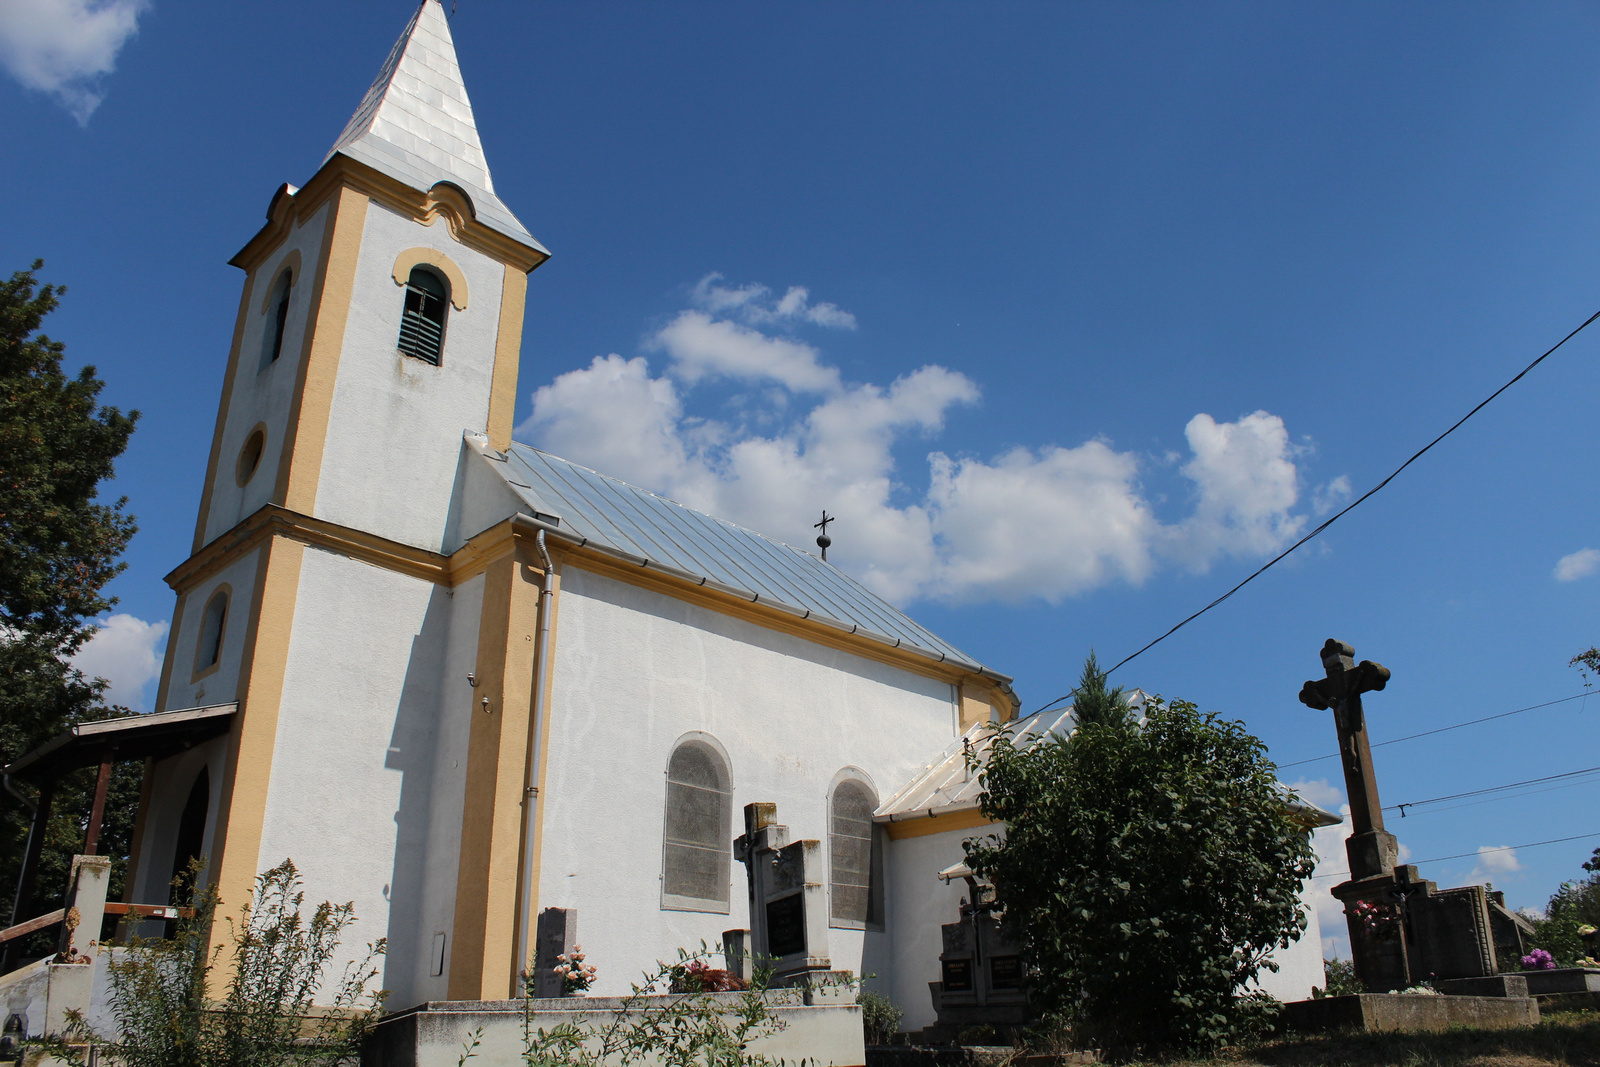 20180819-35-Hernadcece-Templom